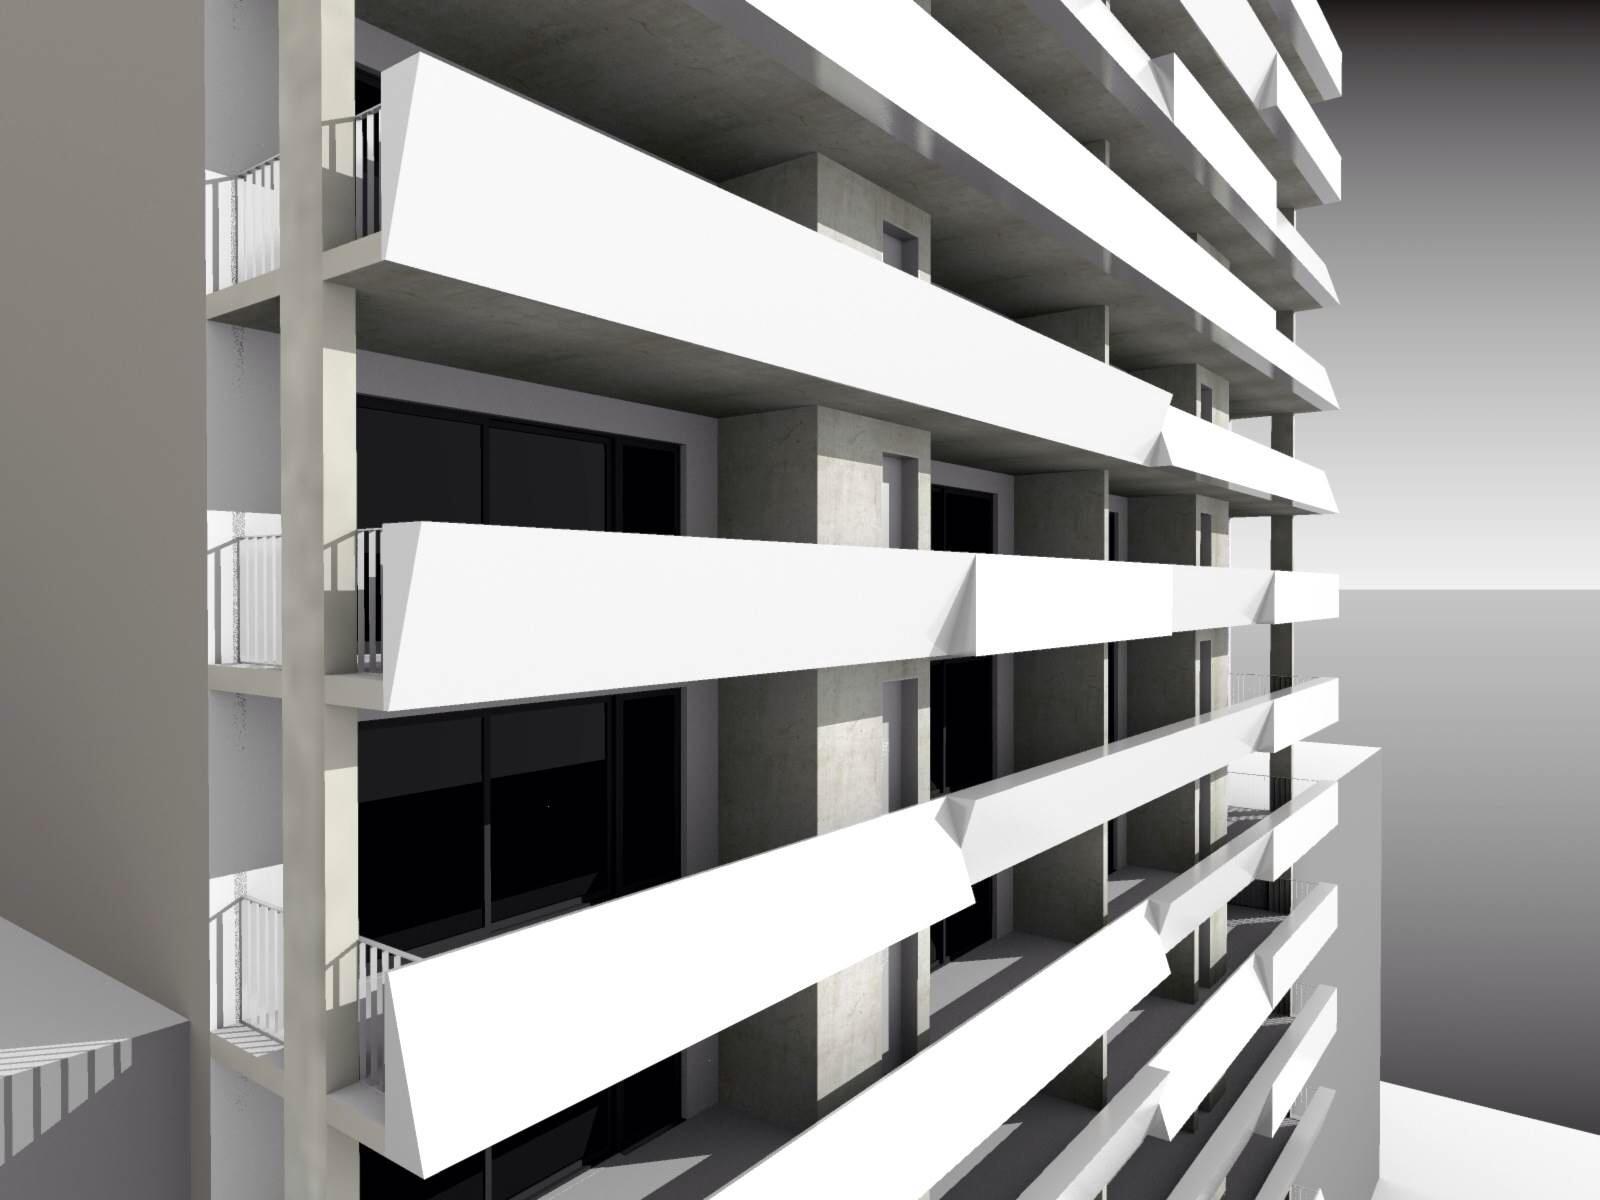 Another rendering of 271 Lenox Road, via Hello Living